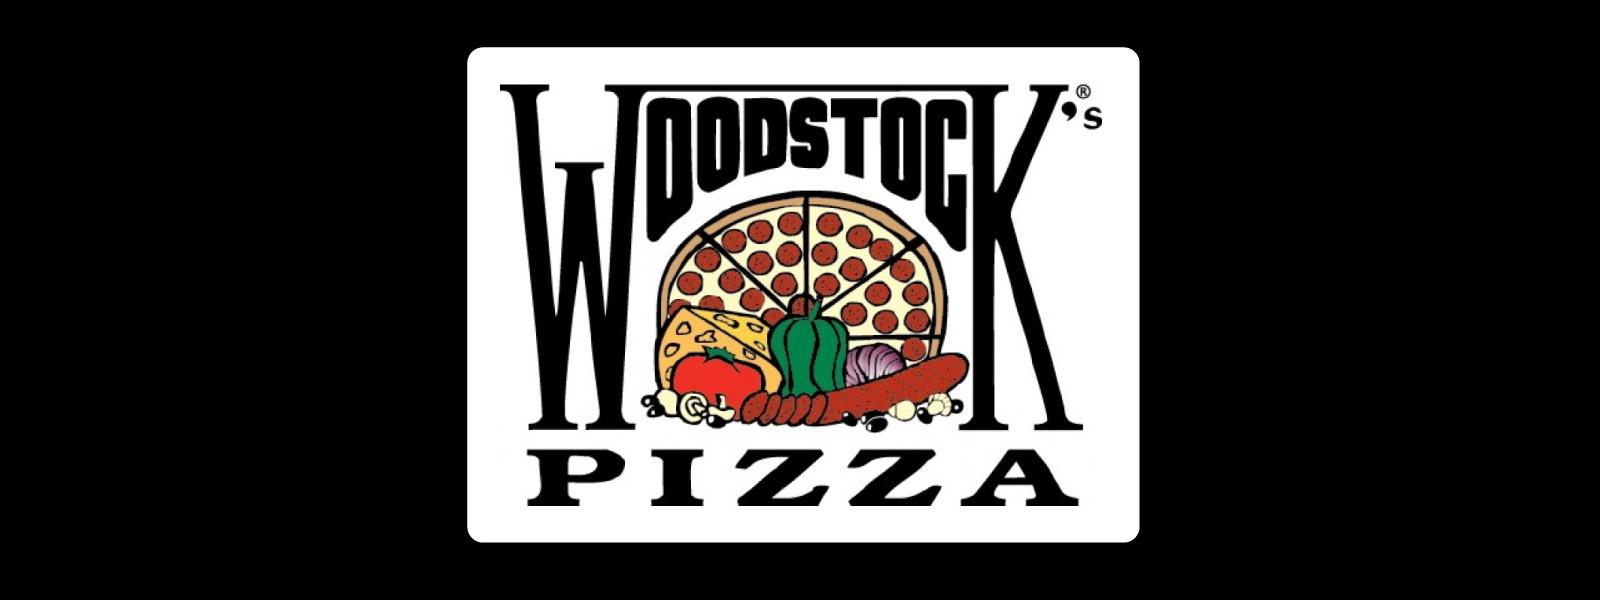 Woodstock-Pizza-header